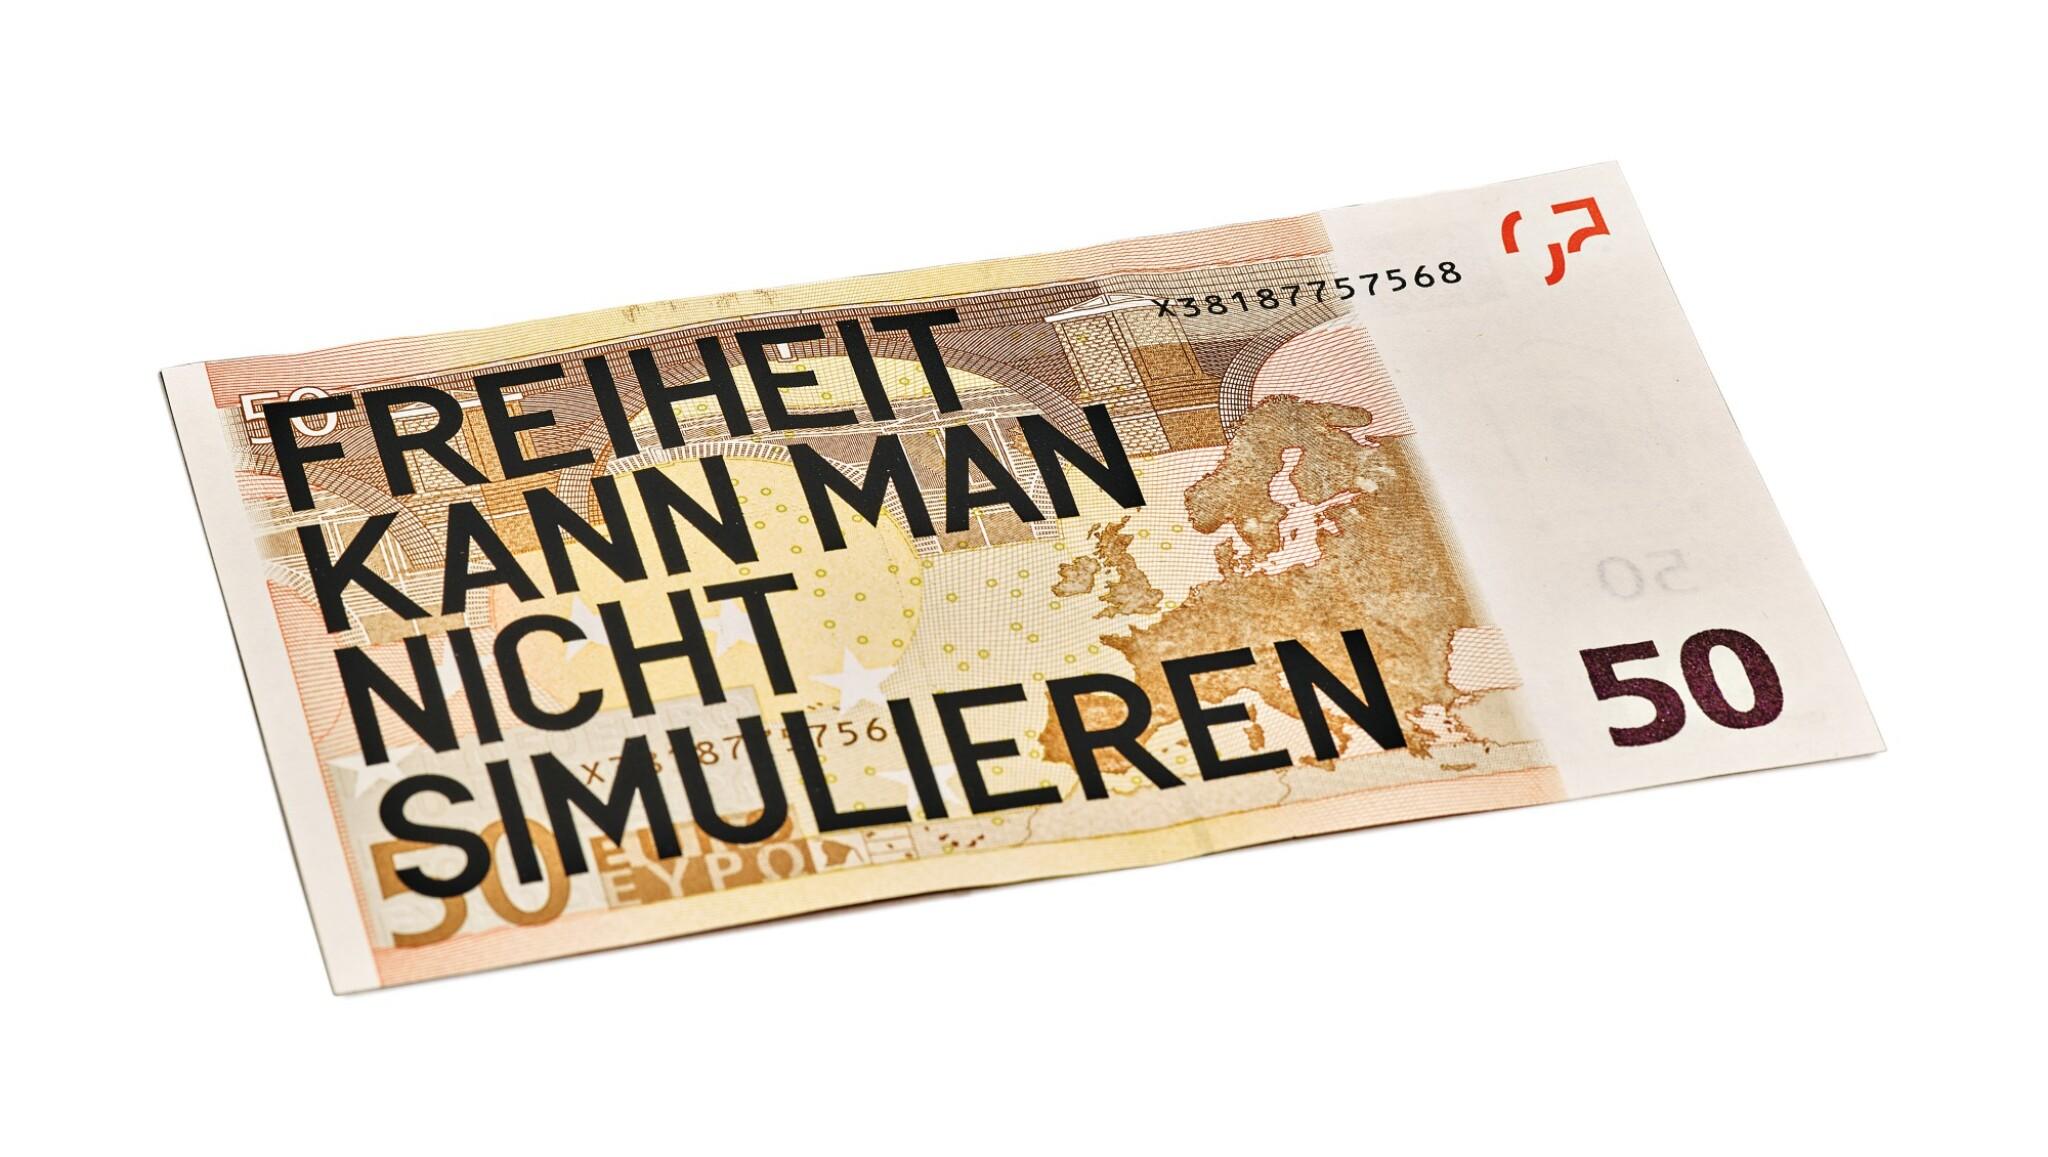 View full screen - View 1 of Lot 13. RIRKRIT TIRAVANIJA | UNTITLED 2008 (50 EURO FREIHEIT KANN MAN NICHT SIMULIEREN).